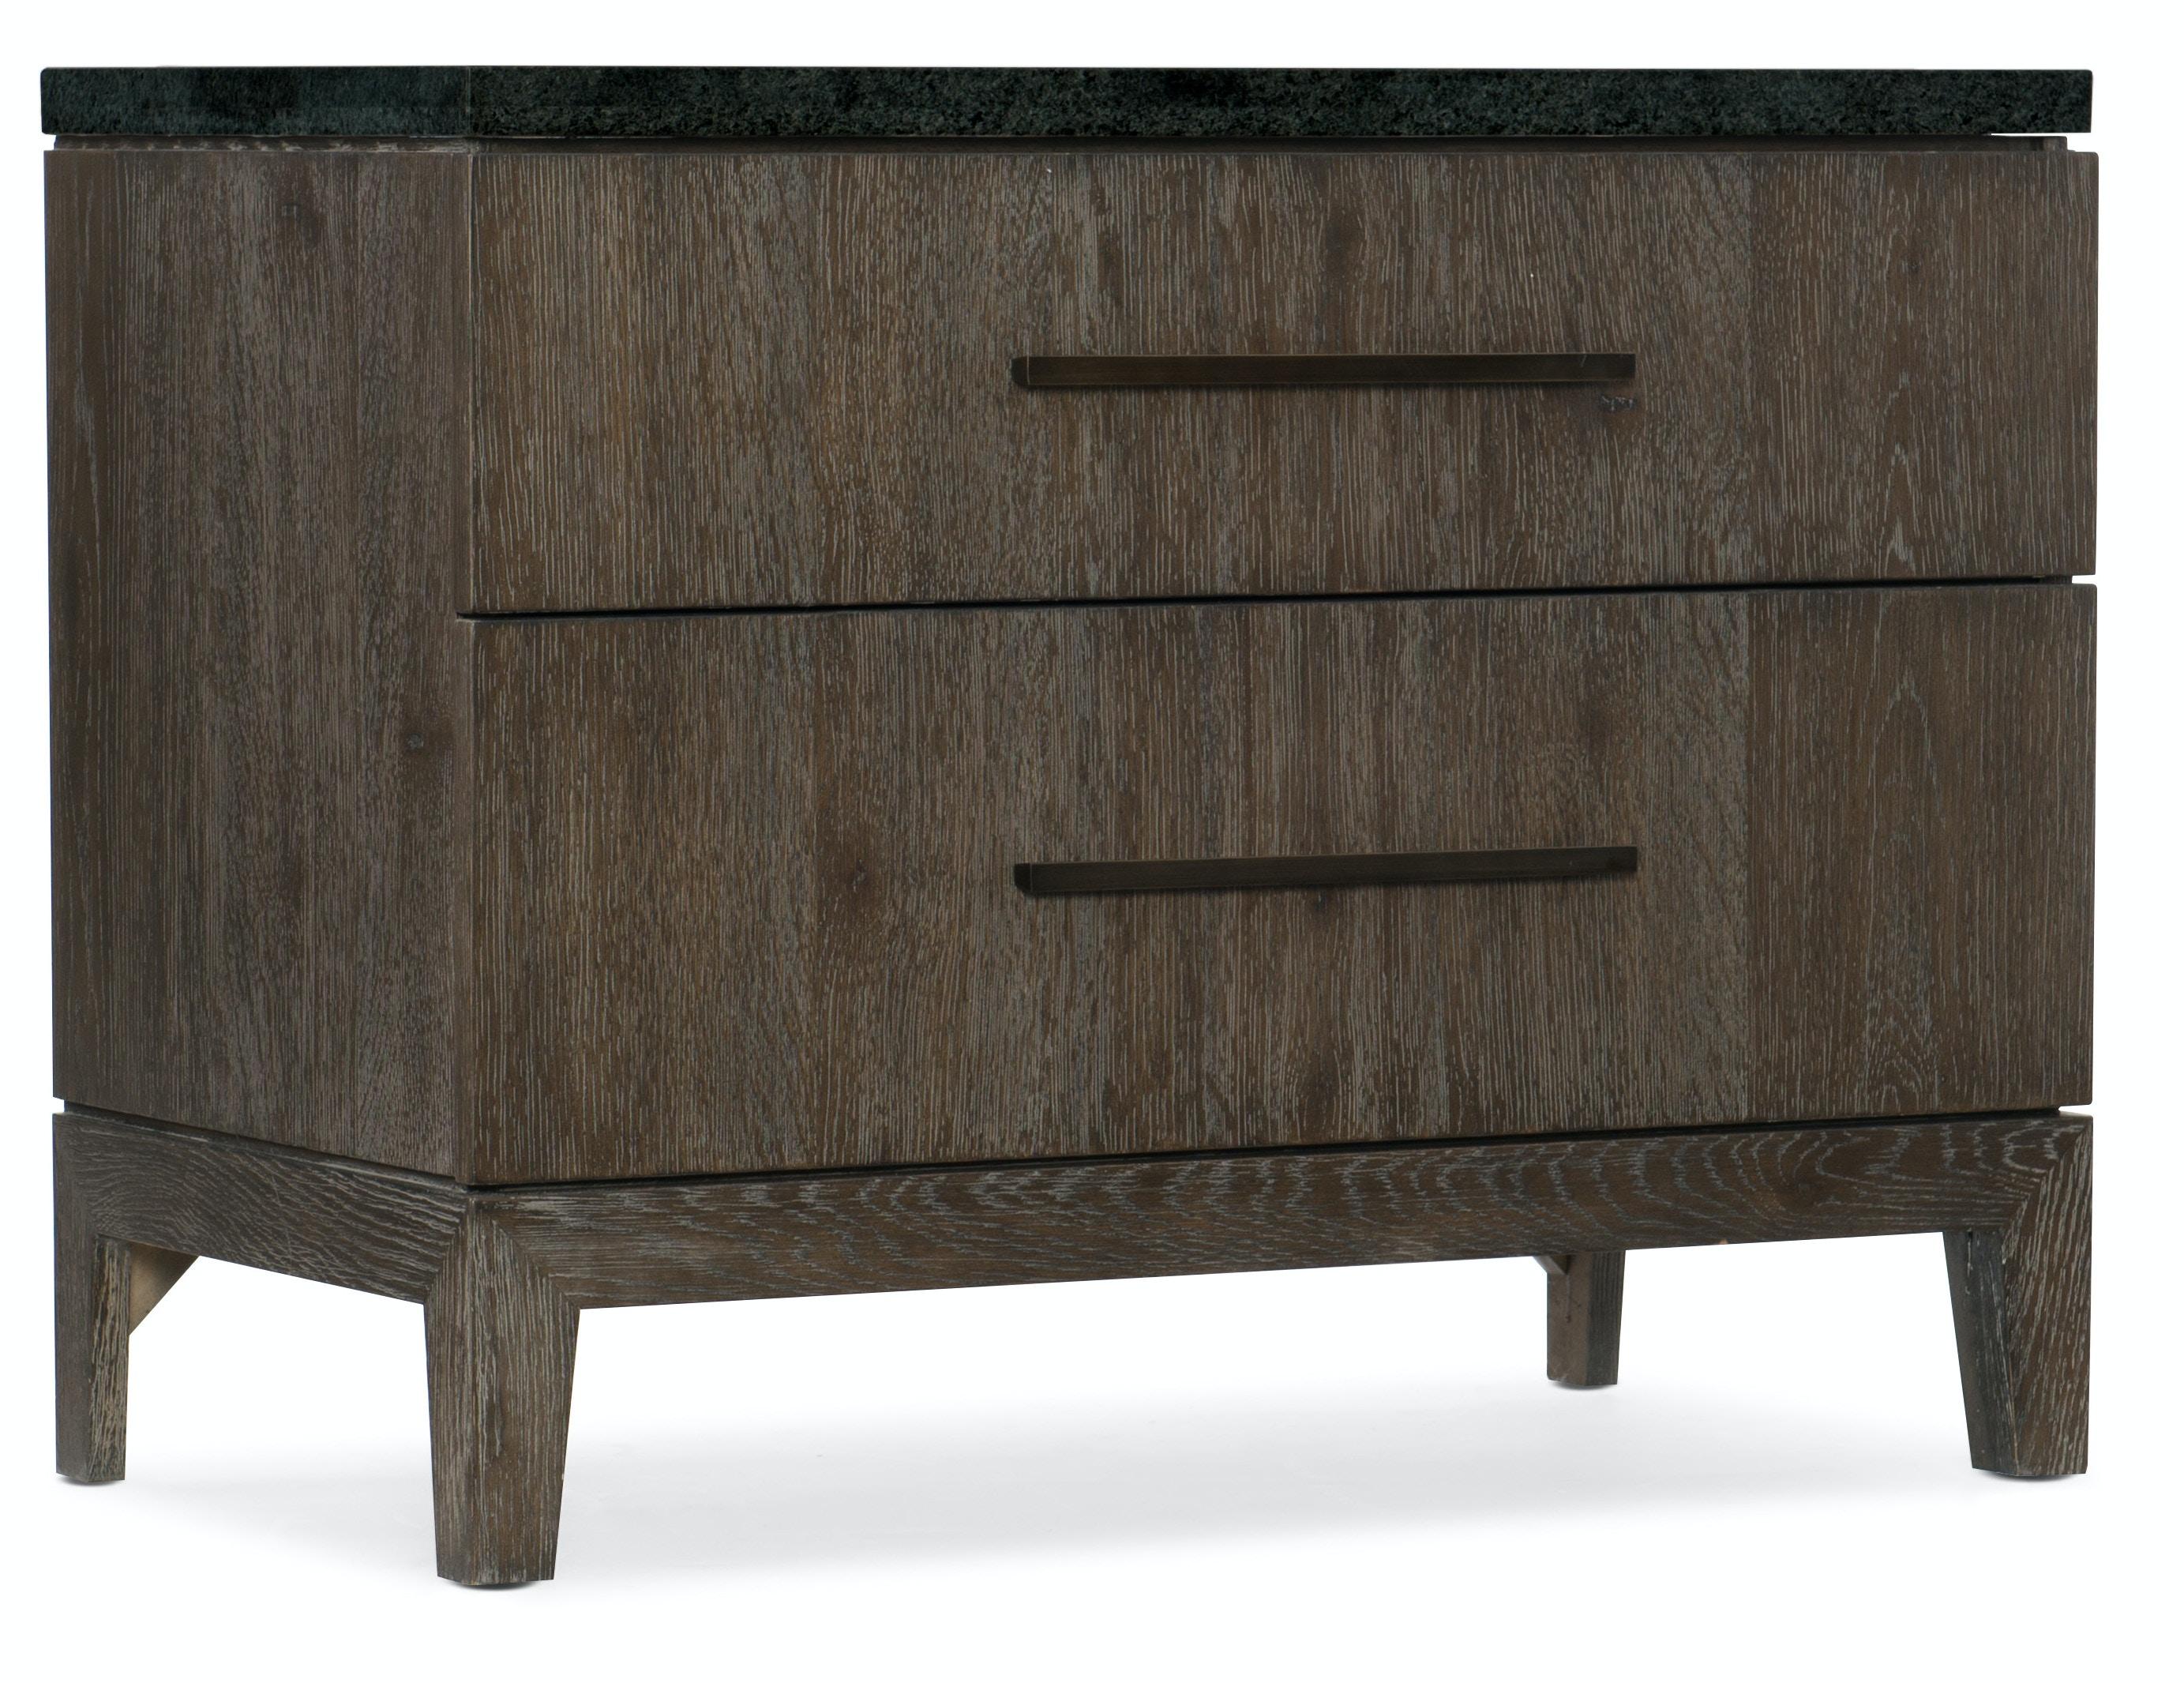 Ordinaire Hooker Furniture Miramar Aventura San Marcos Stone Top Nightstand  6202 90015 DKW